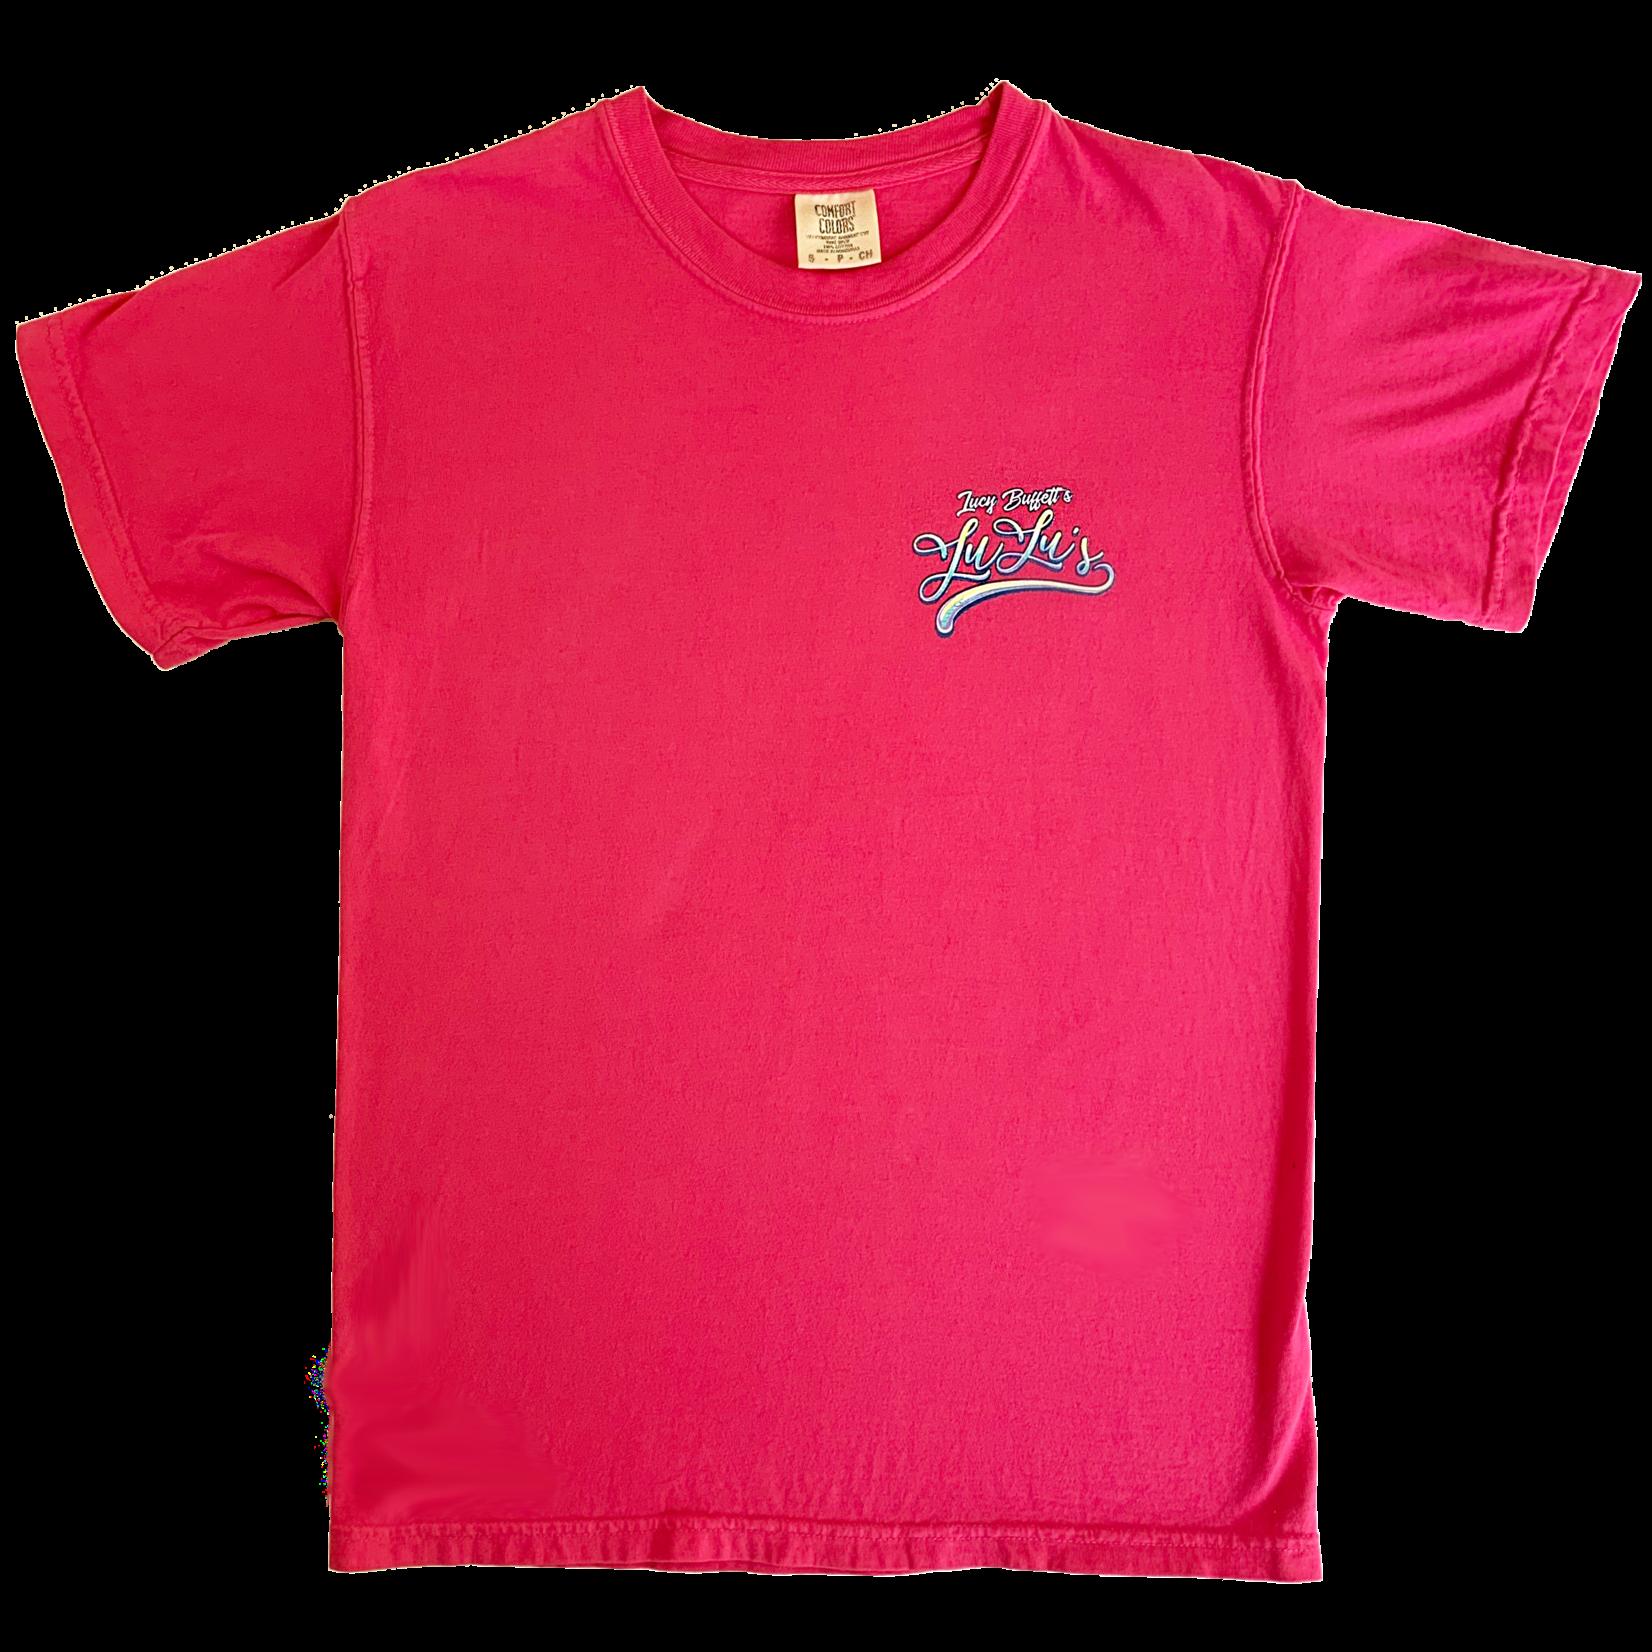 LuLu's Brand Apparel LuLu's Jeep Tee